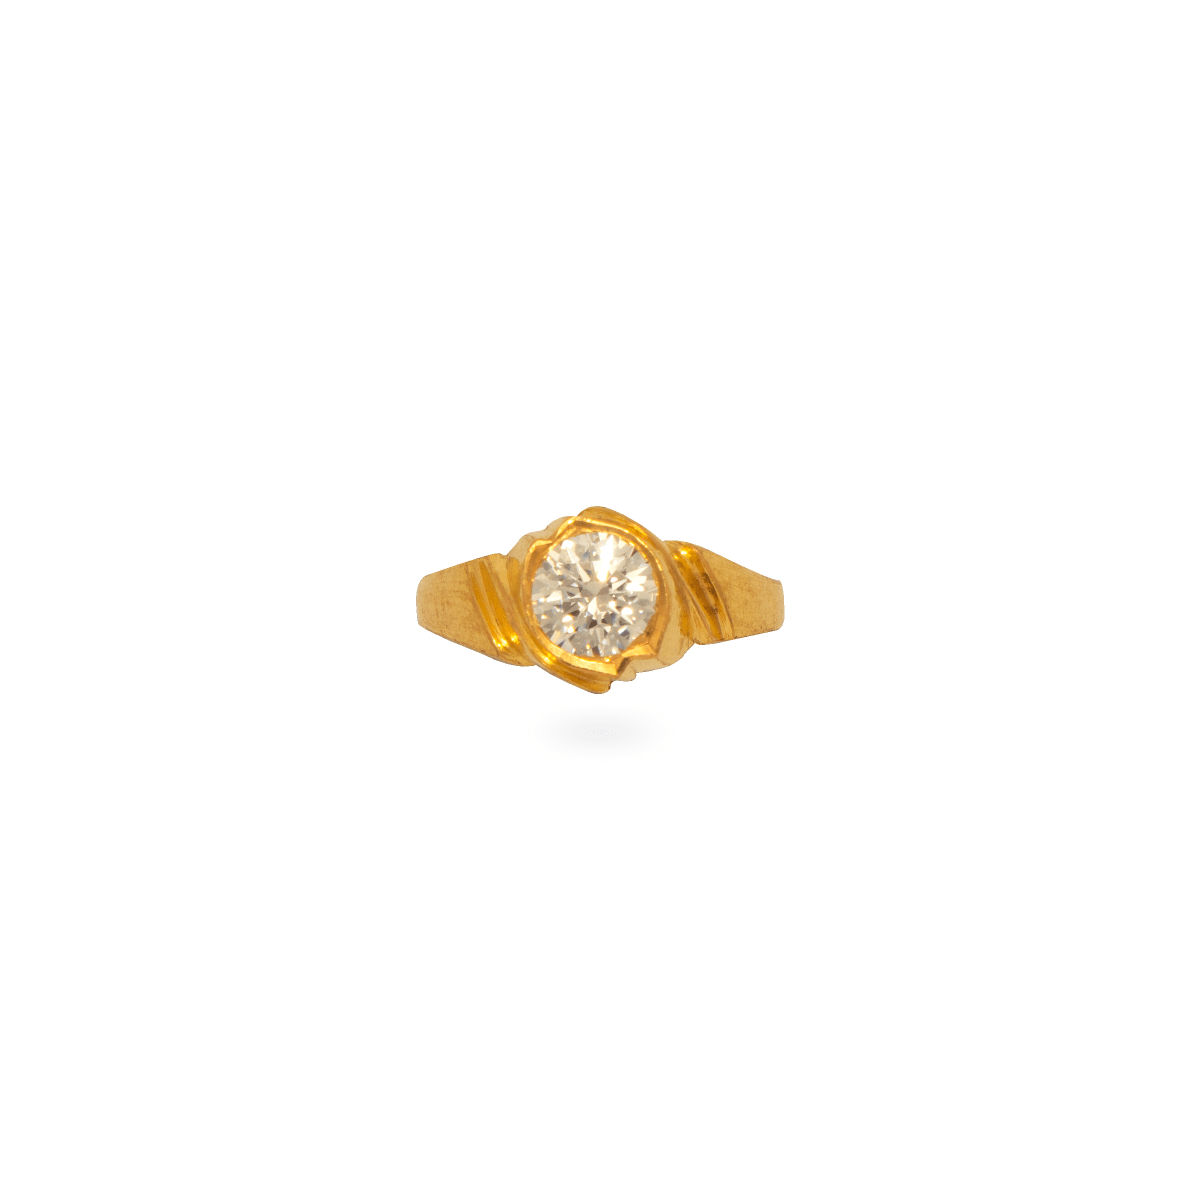 Maharaja Ring